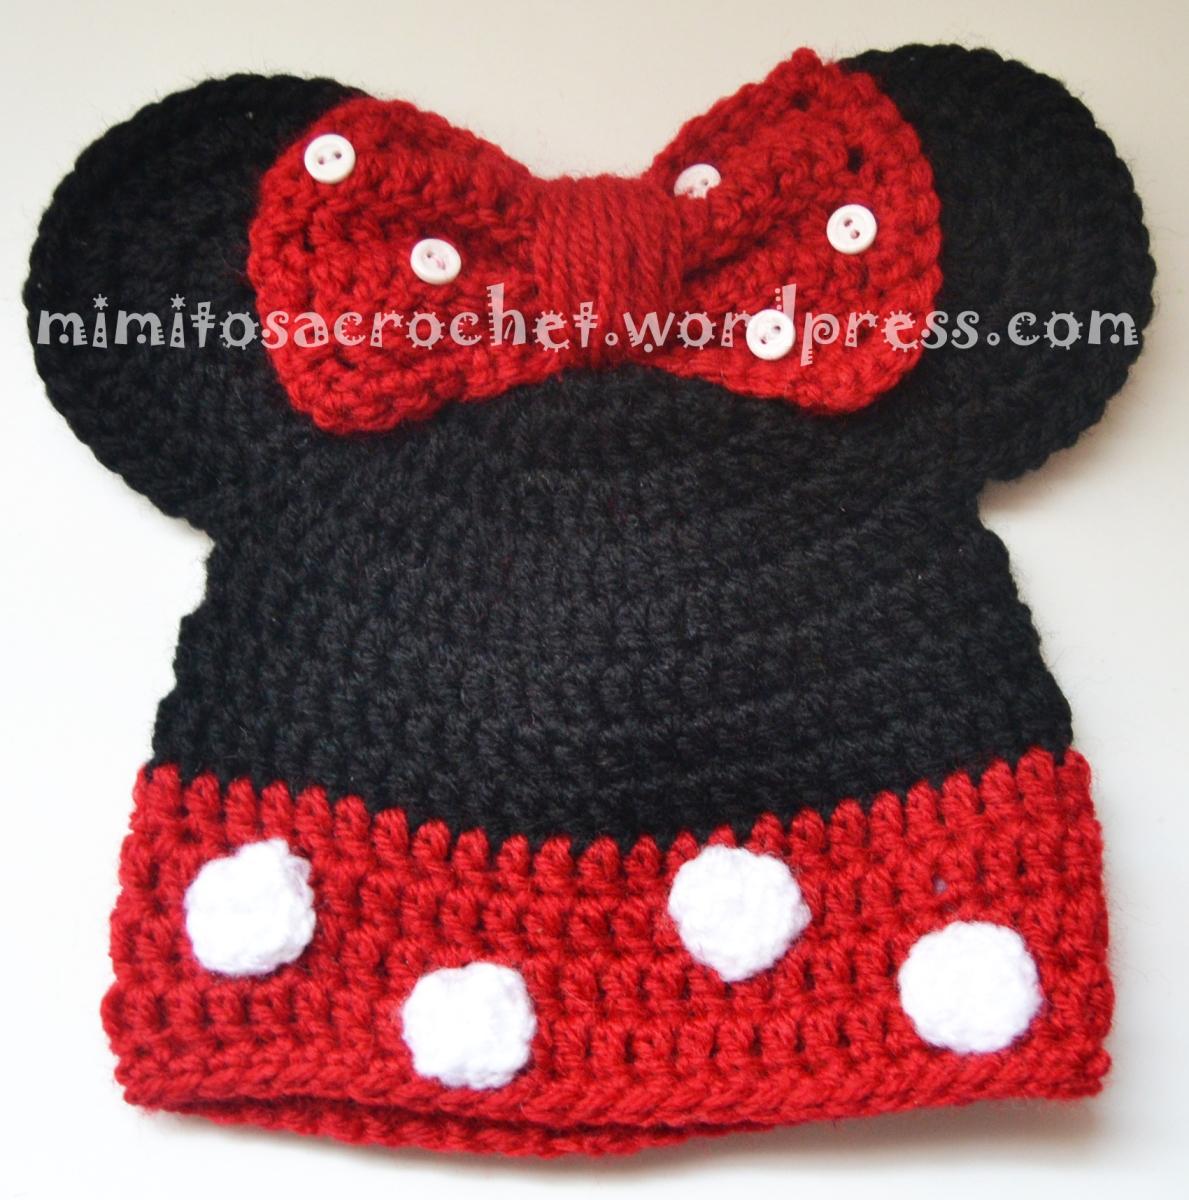 Gorros de Mickey y Minnie Mouse a Crochet – Mimitos a Crochet